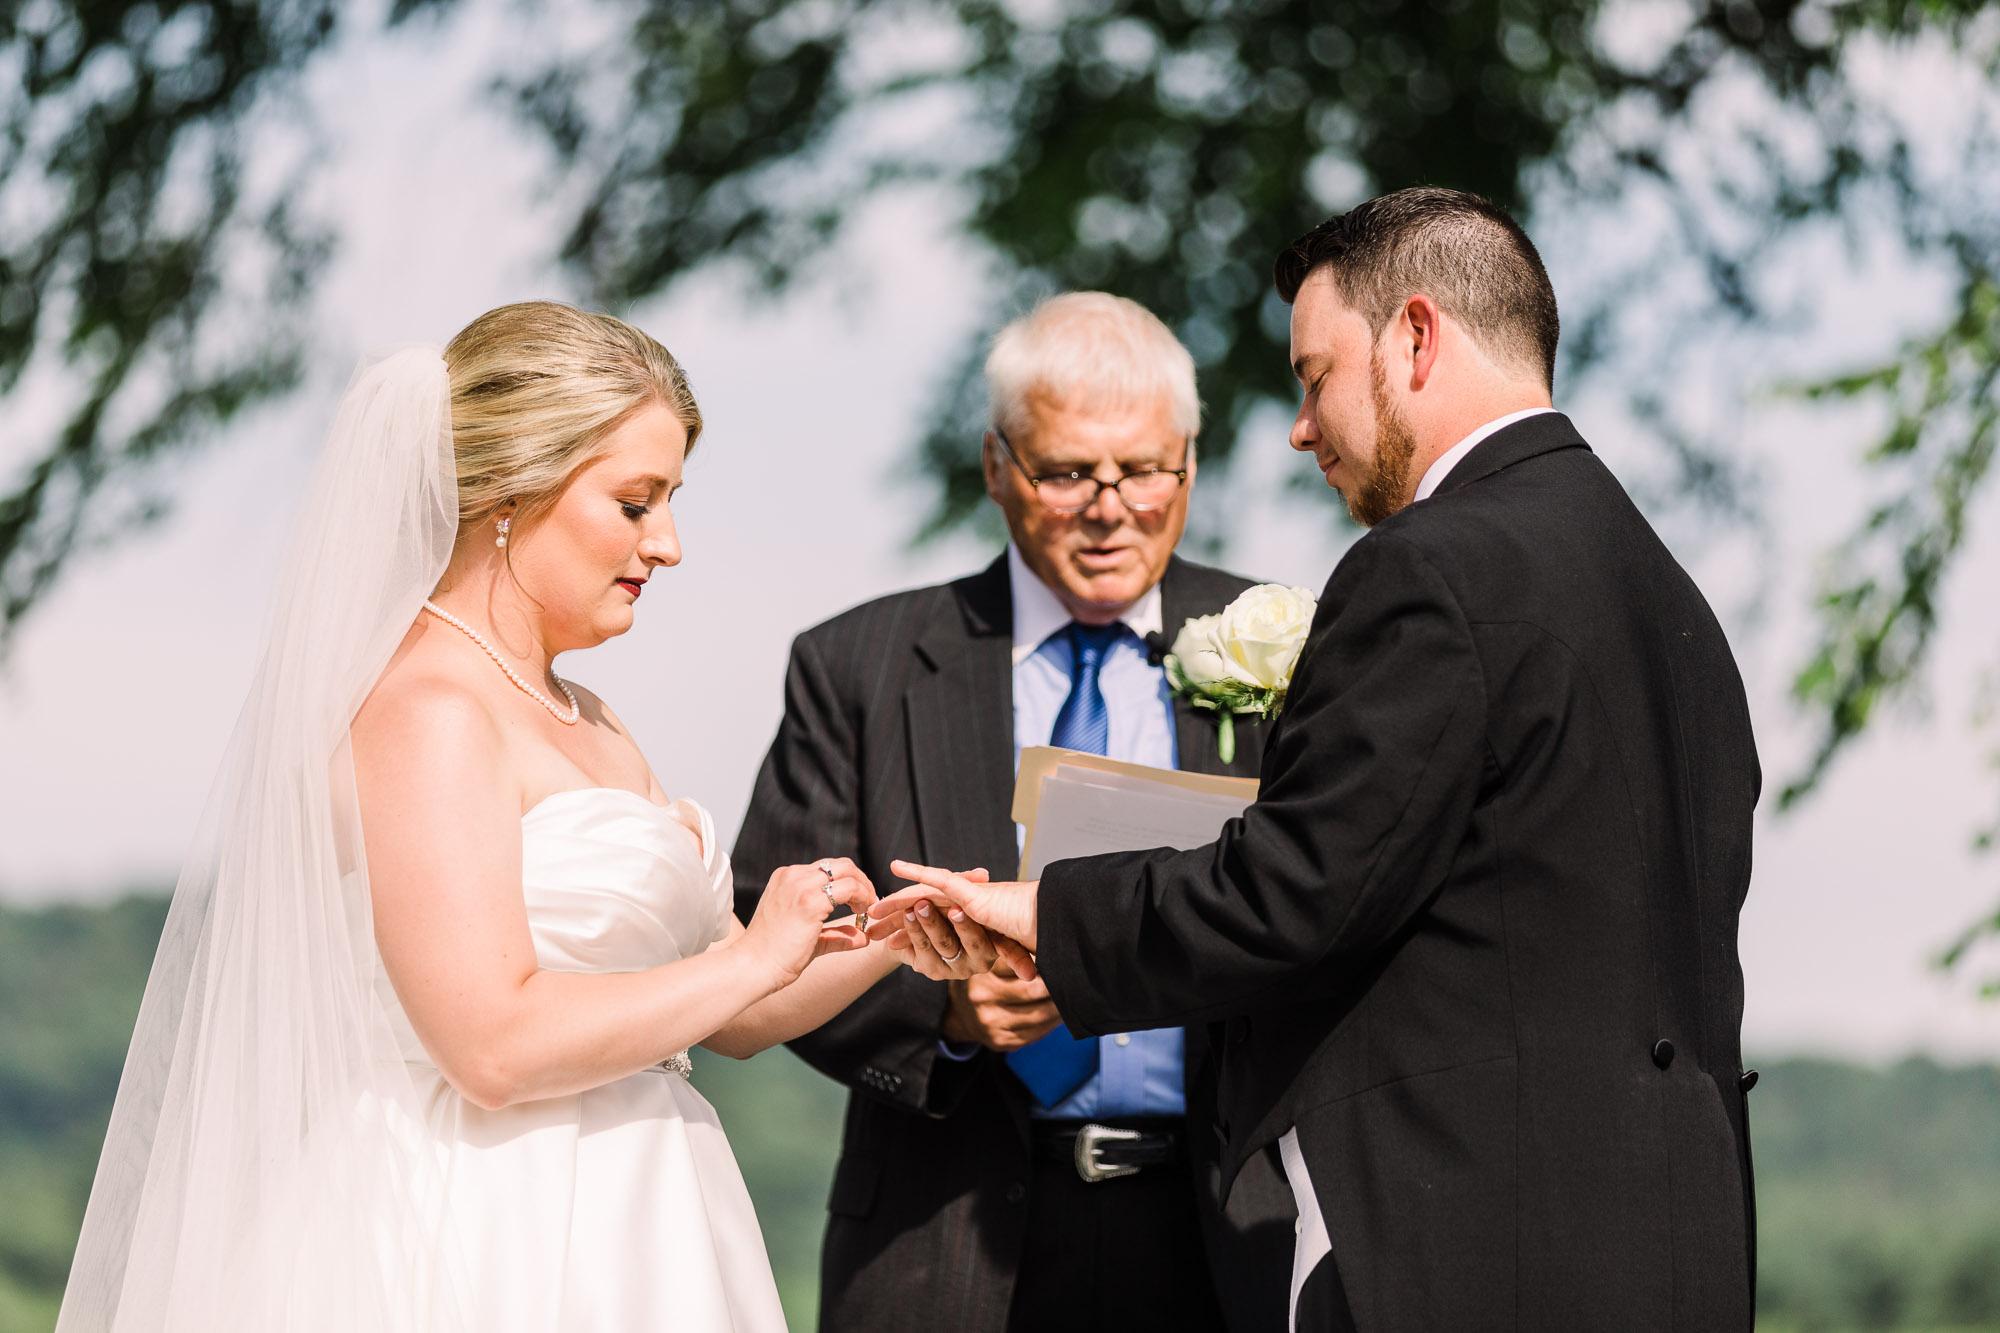 isle-of-que-wedding-3878.jpg